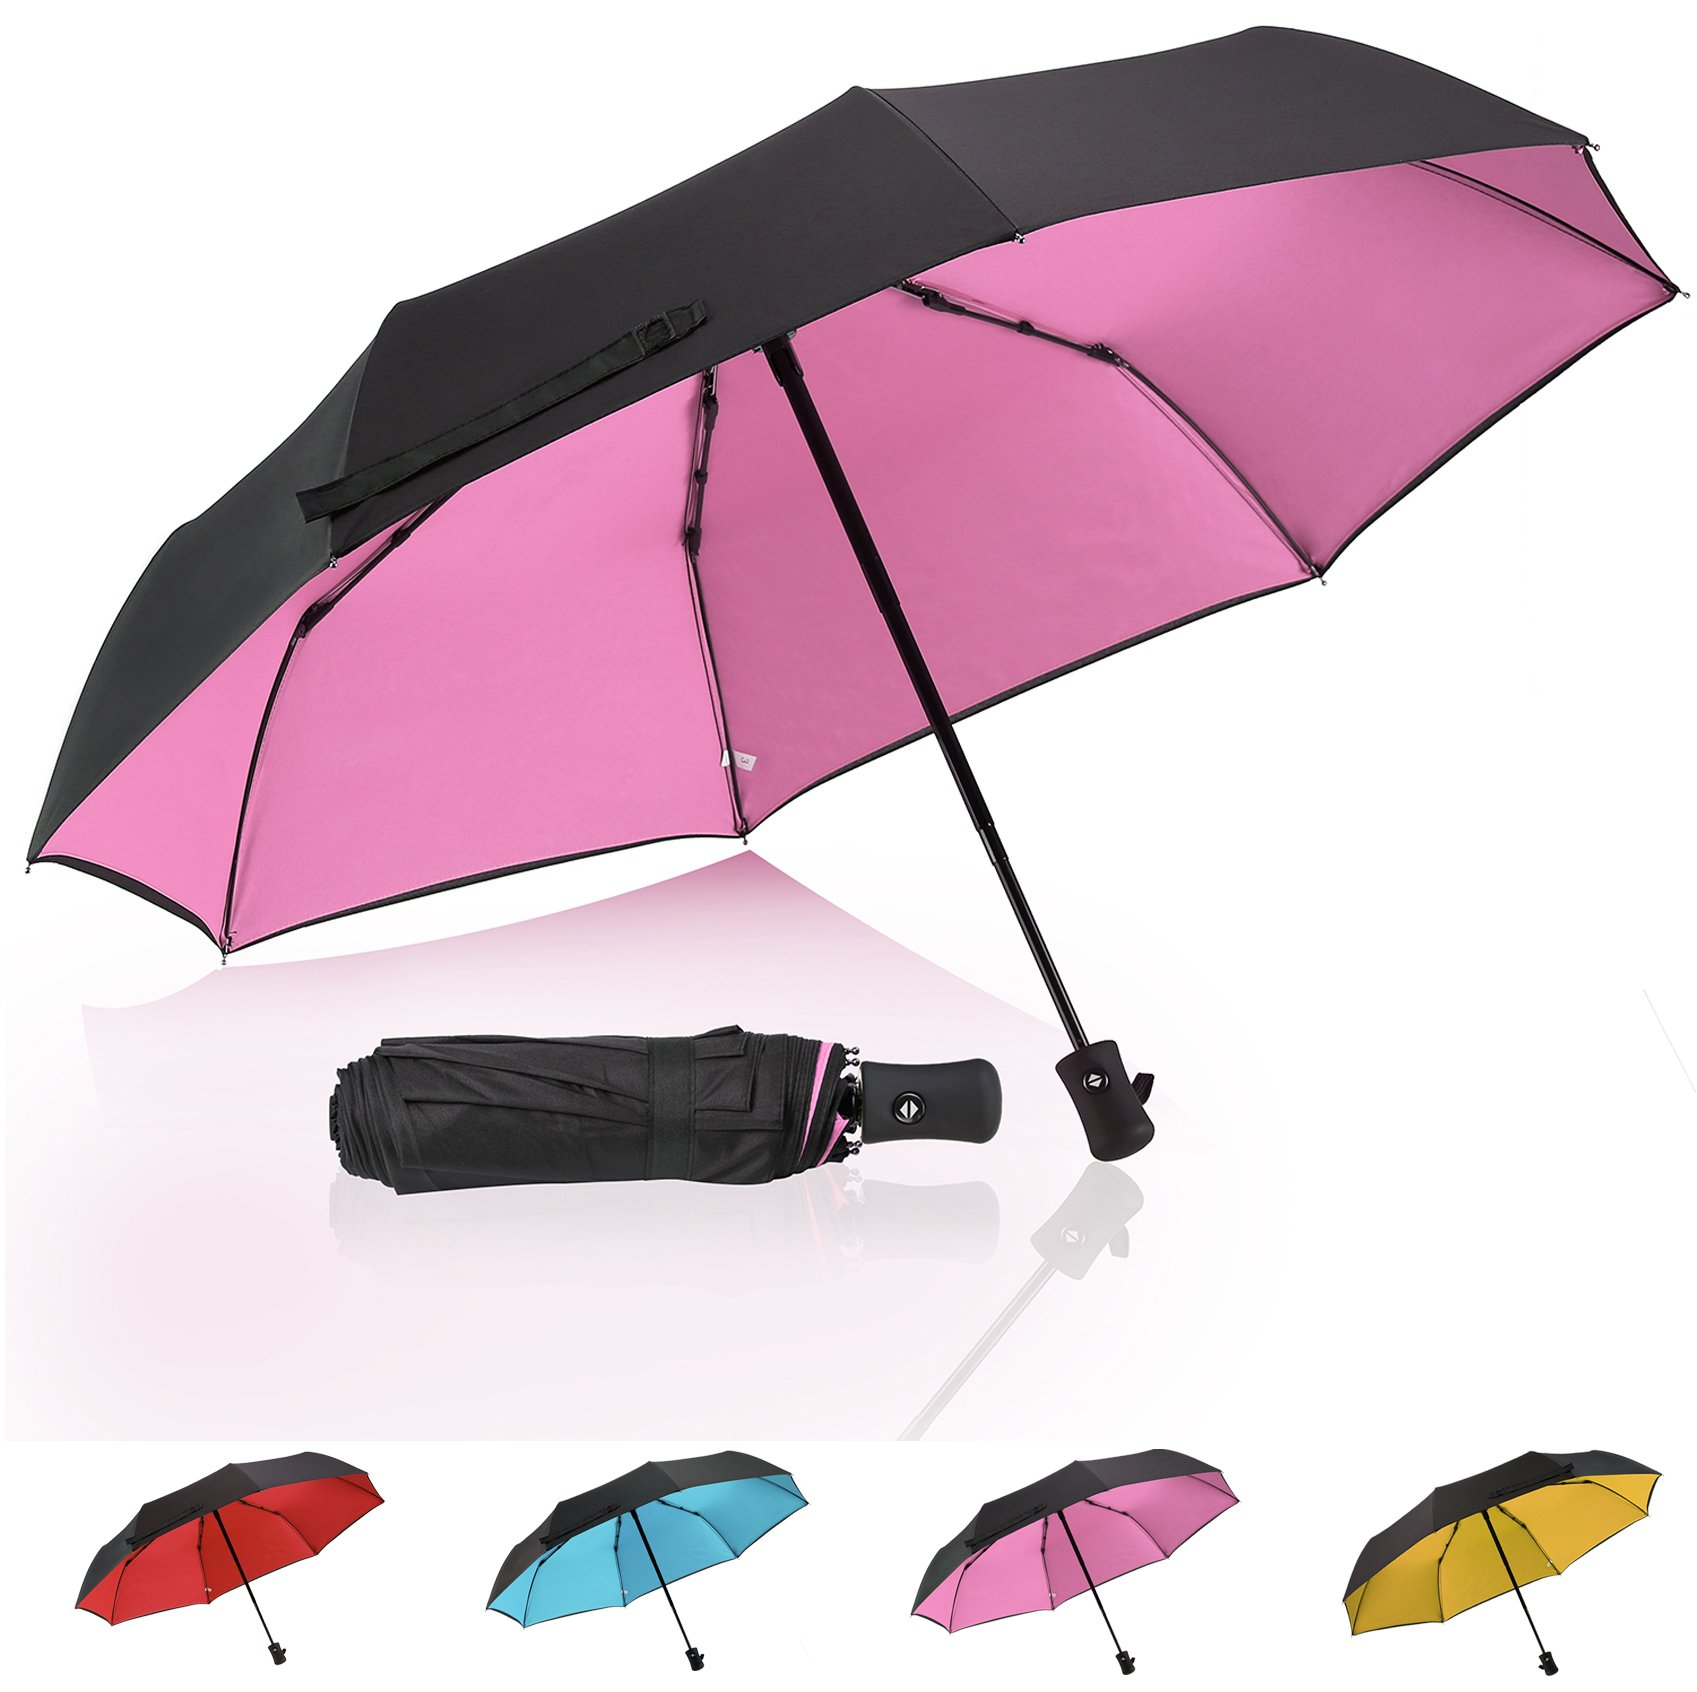 Windproof Umbrella Auto Open Close Folded Umbrella Double Canopy Vented Waterproof Umbrella Compact Pink umbrella - by QH